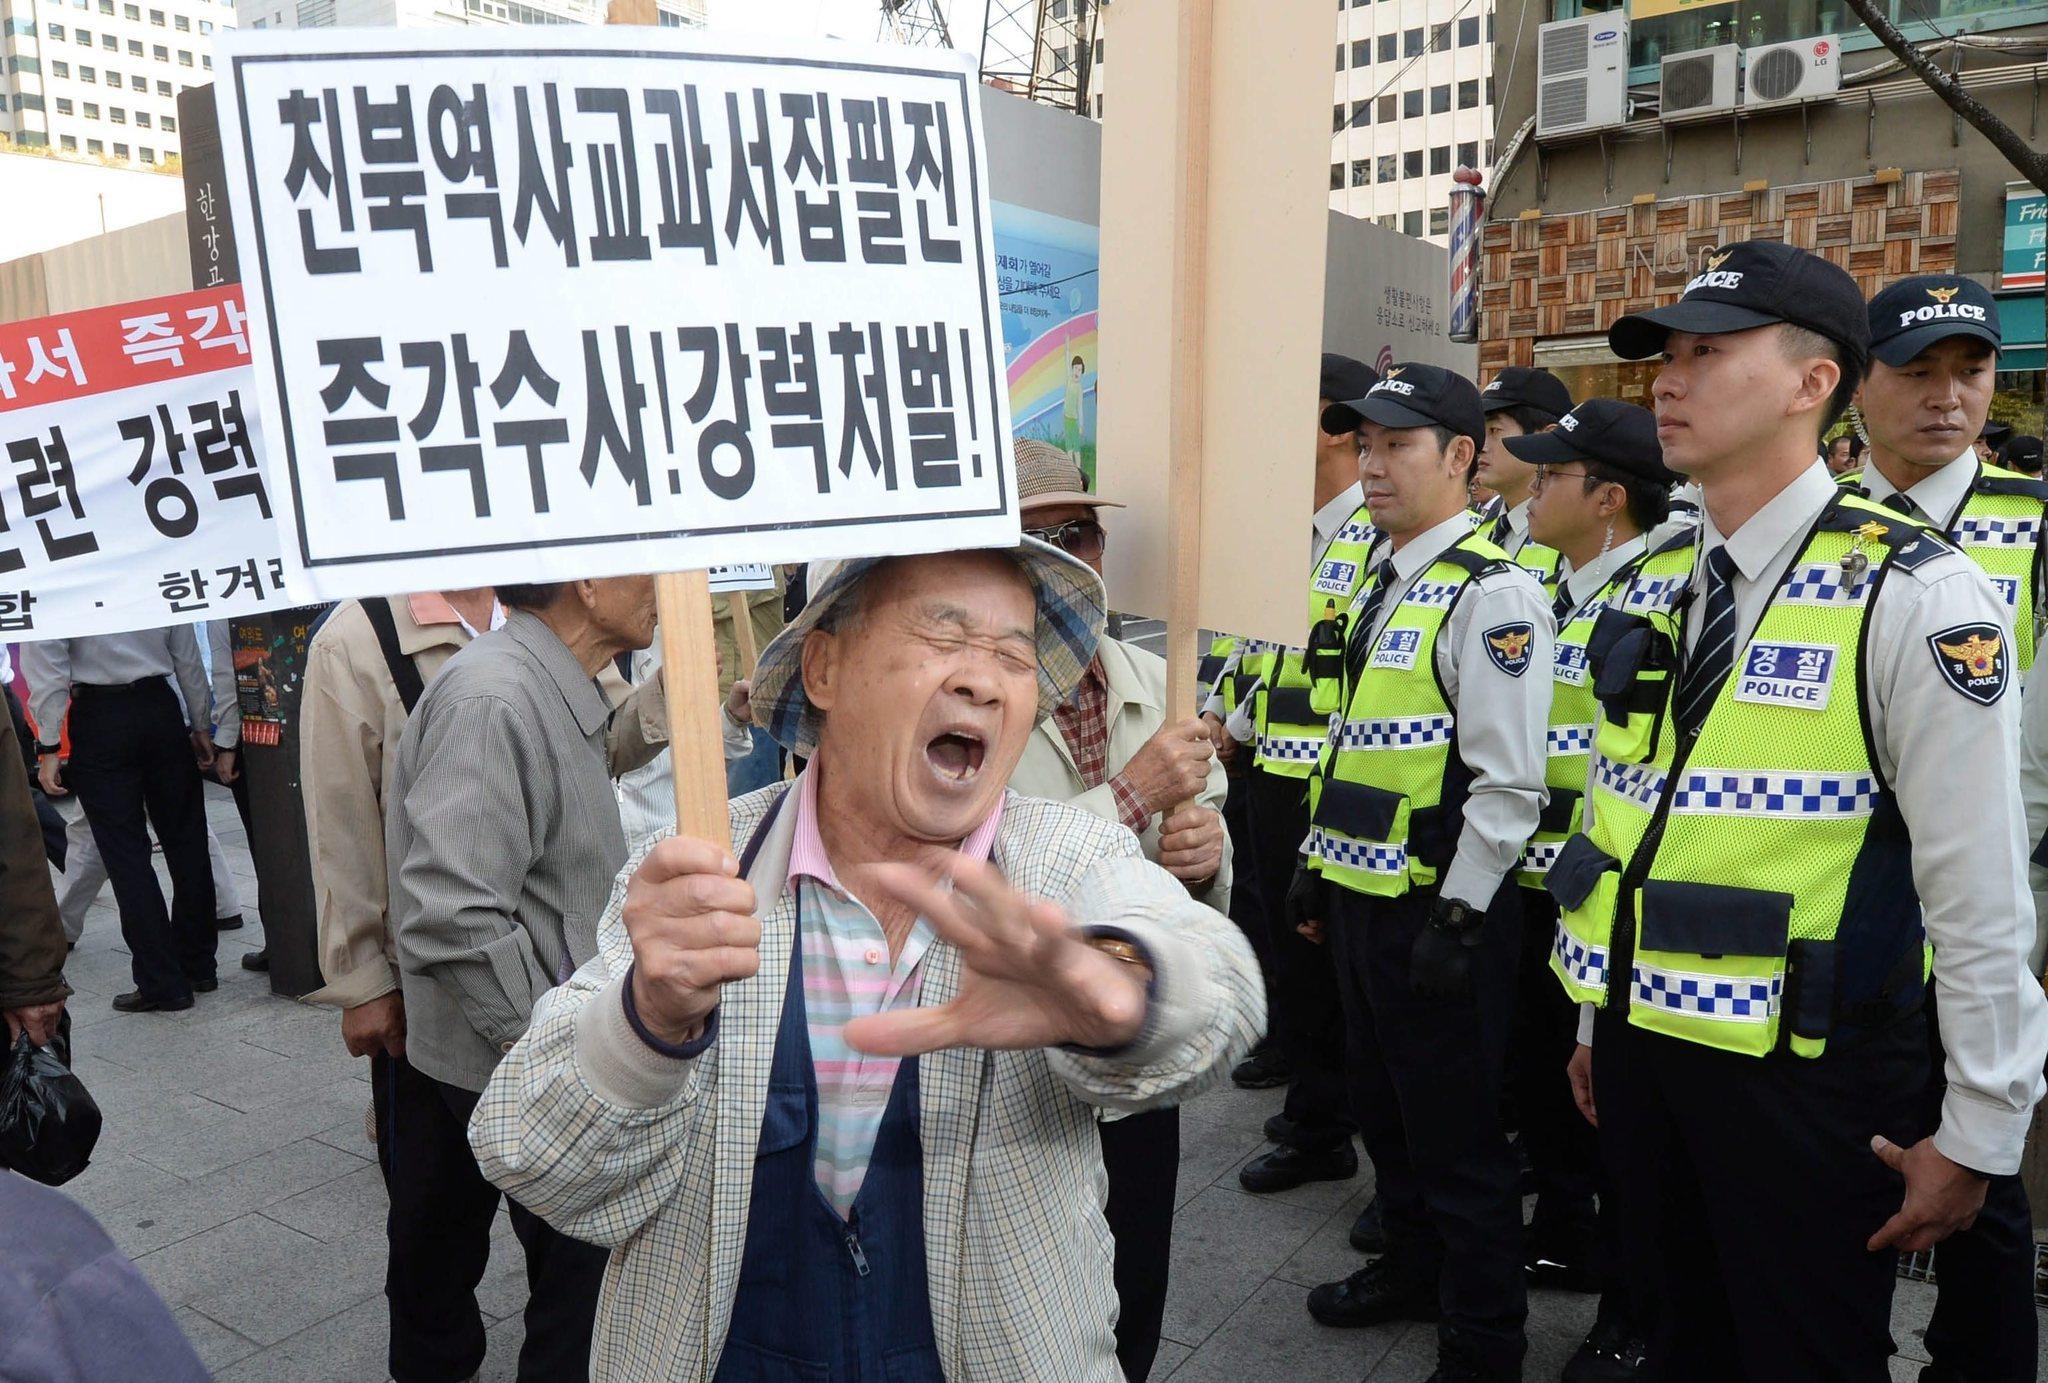 Good deabte topics about Korea or Japan?